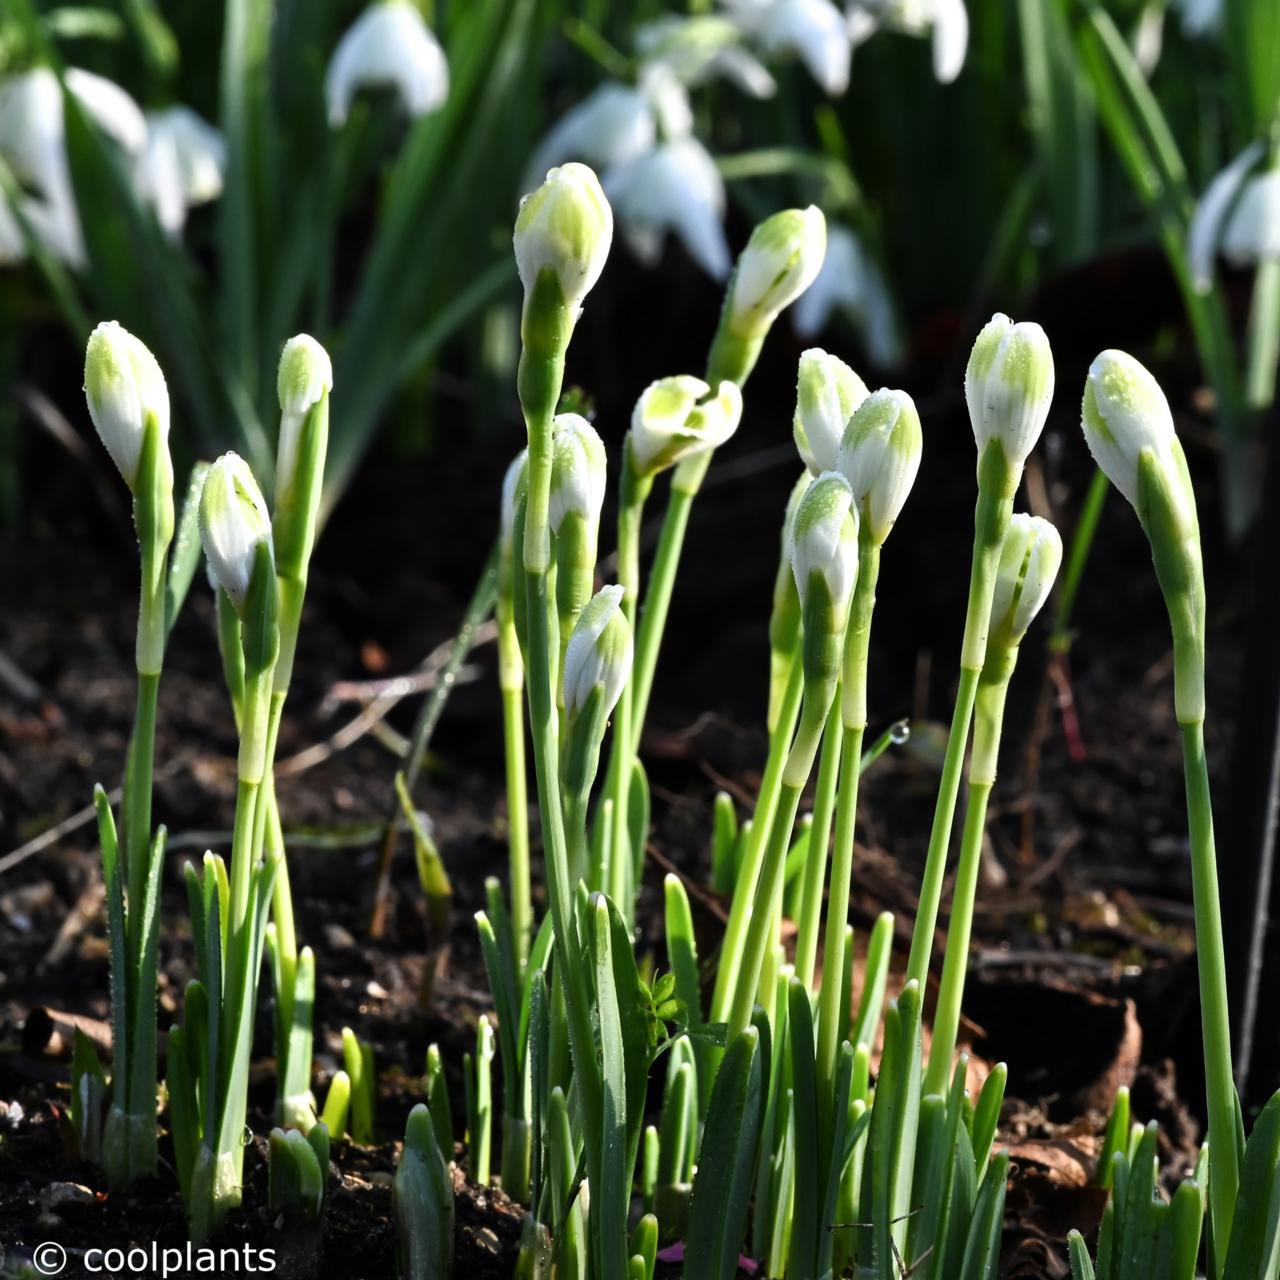 Galanthus 'Funny Justine' plant